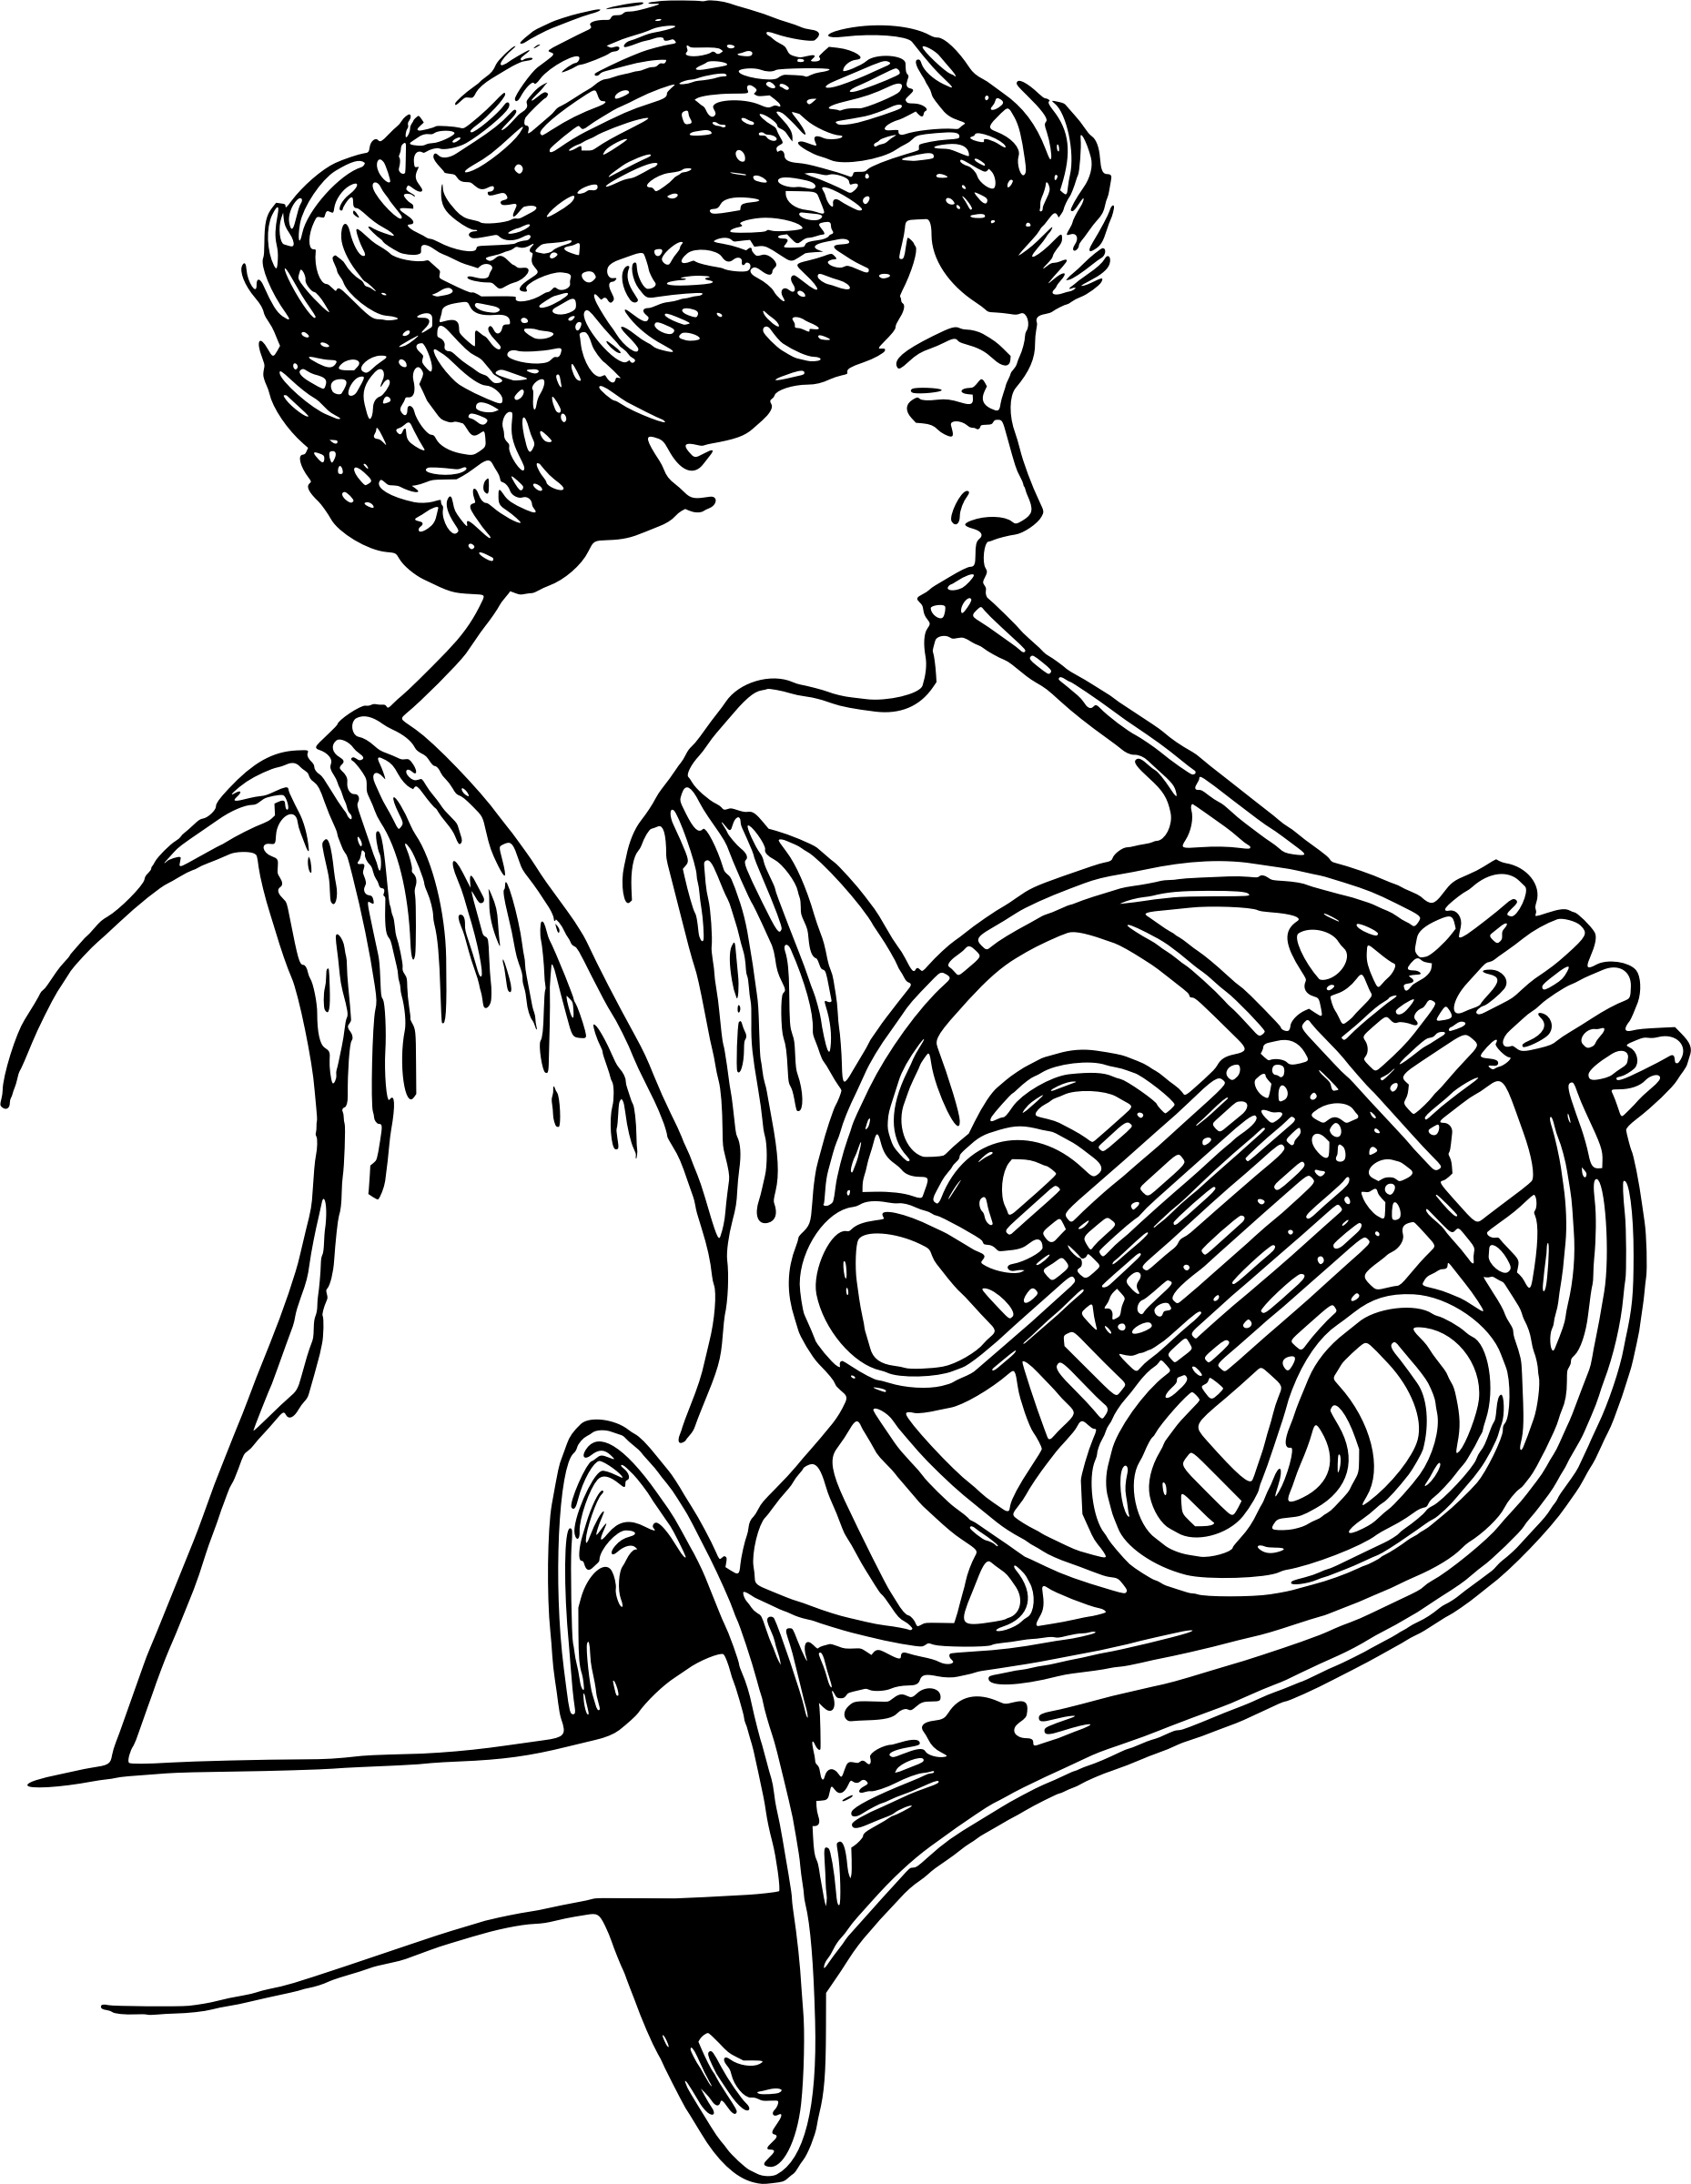 French horn 2 by Firkin in 2019.